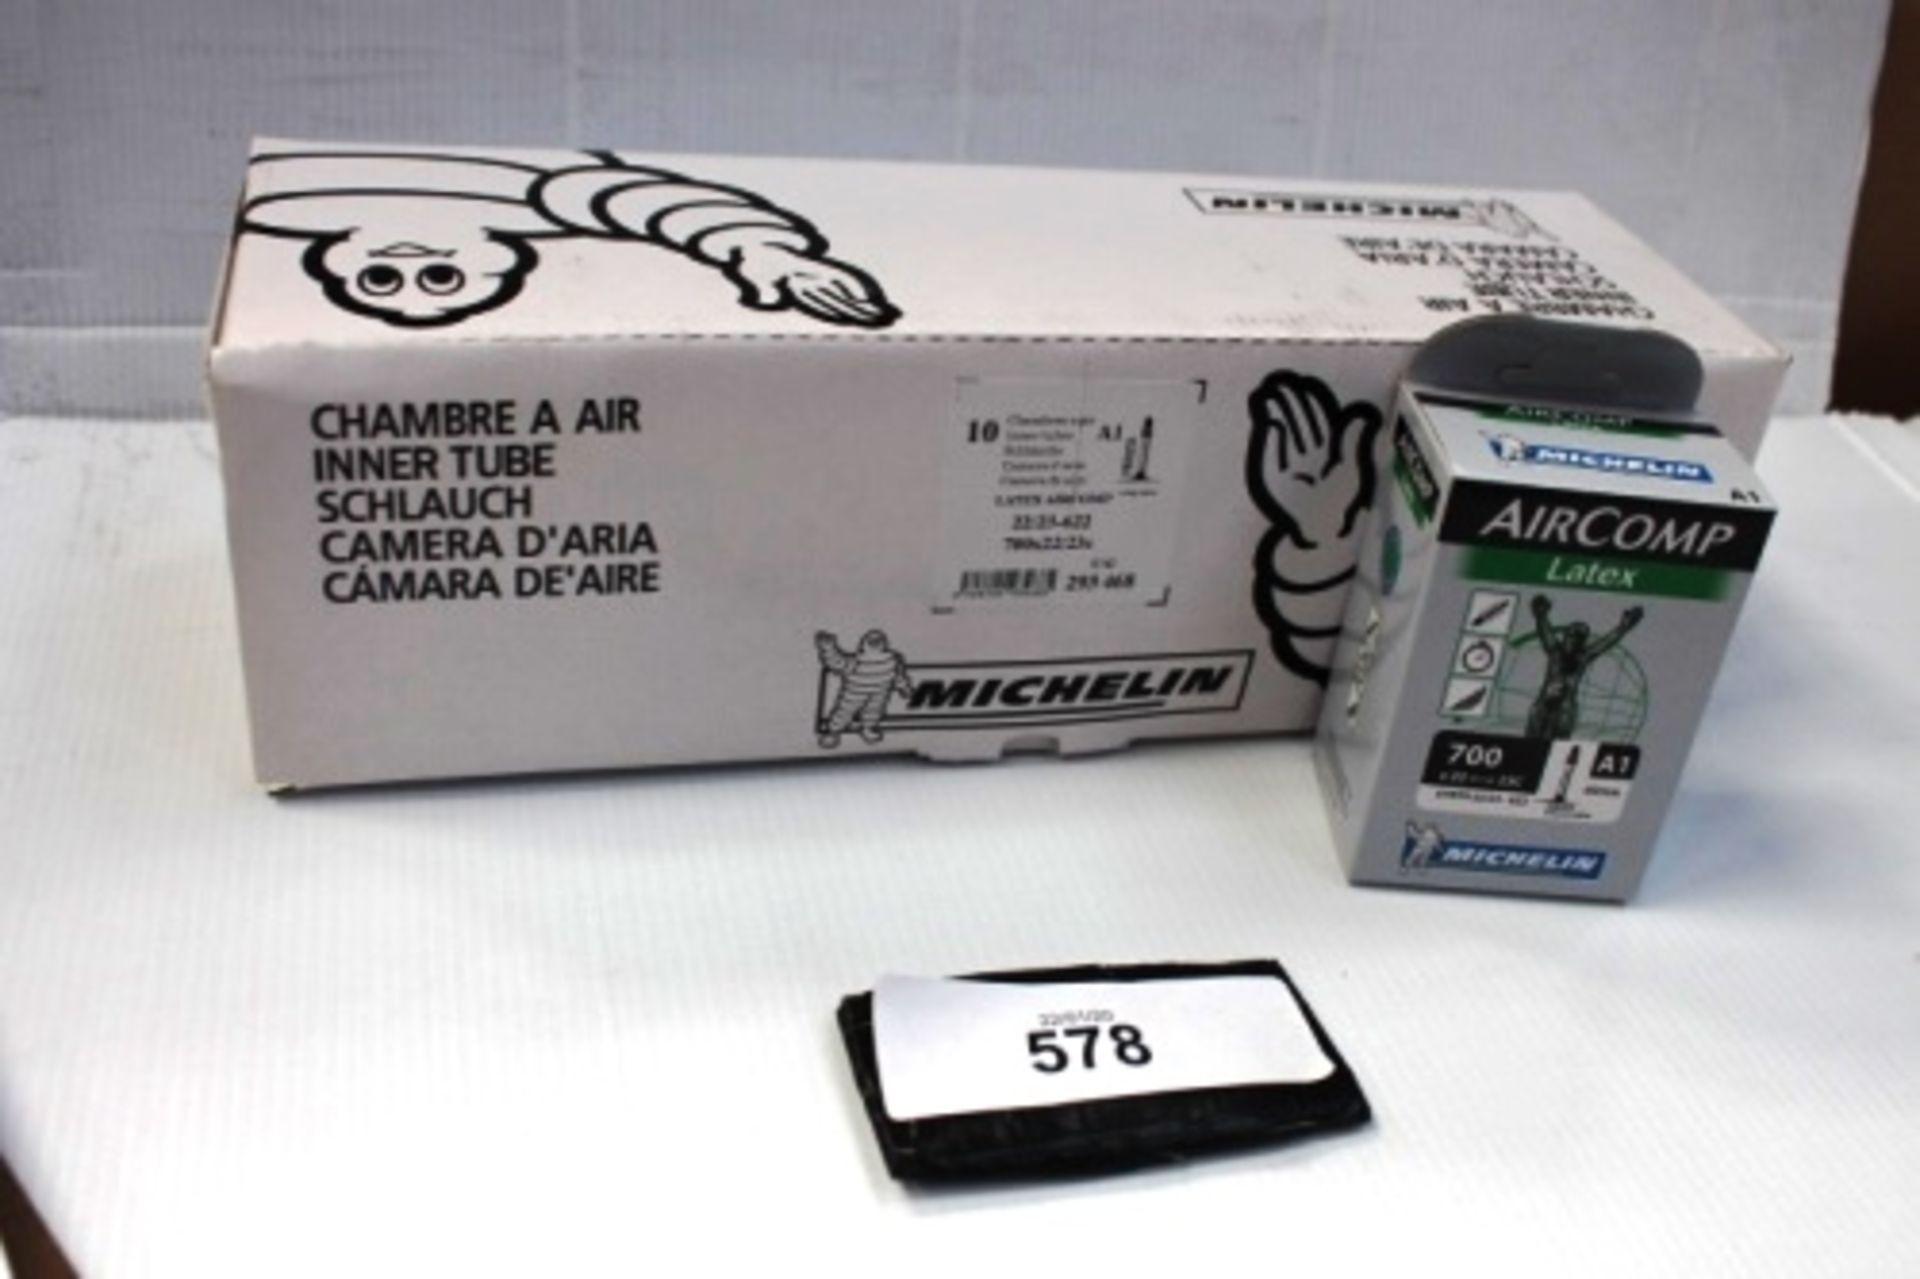 Lot 578 - 10 x Michelin Air Comp Latex 60mm 700 x 22/23C inner tubes - New in box (ES13)